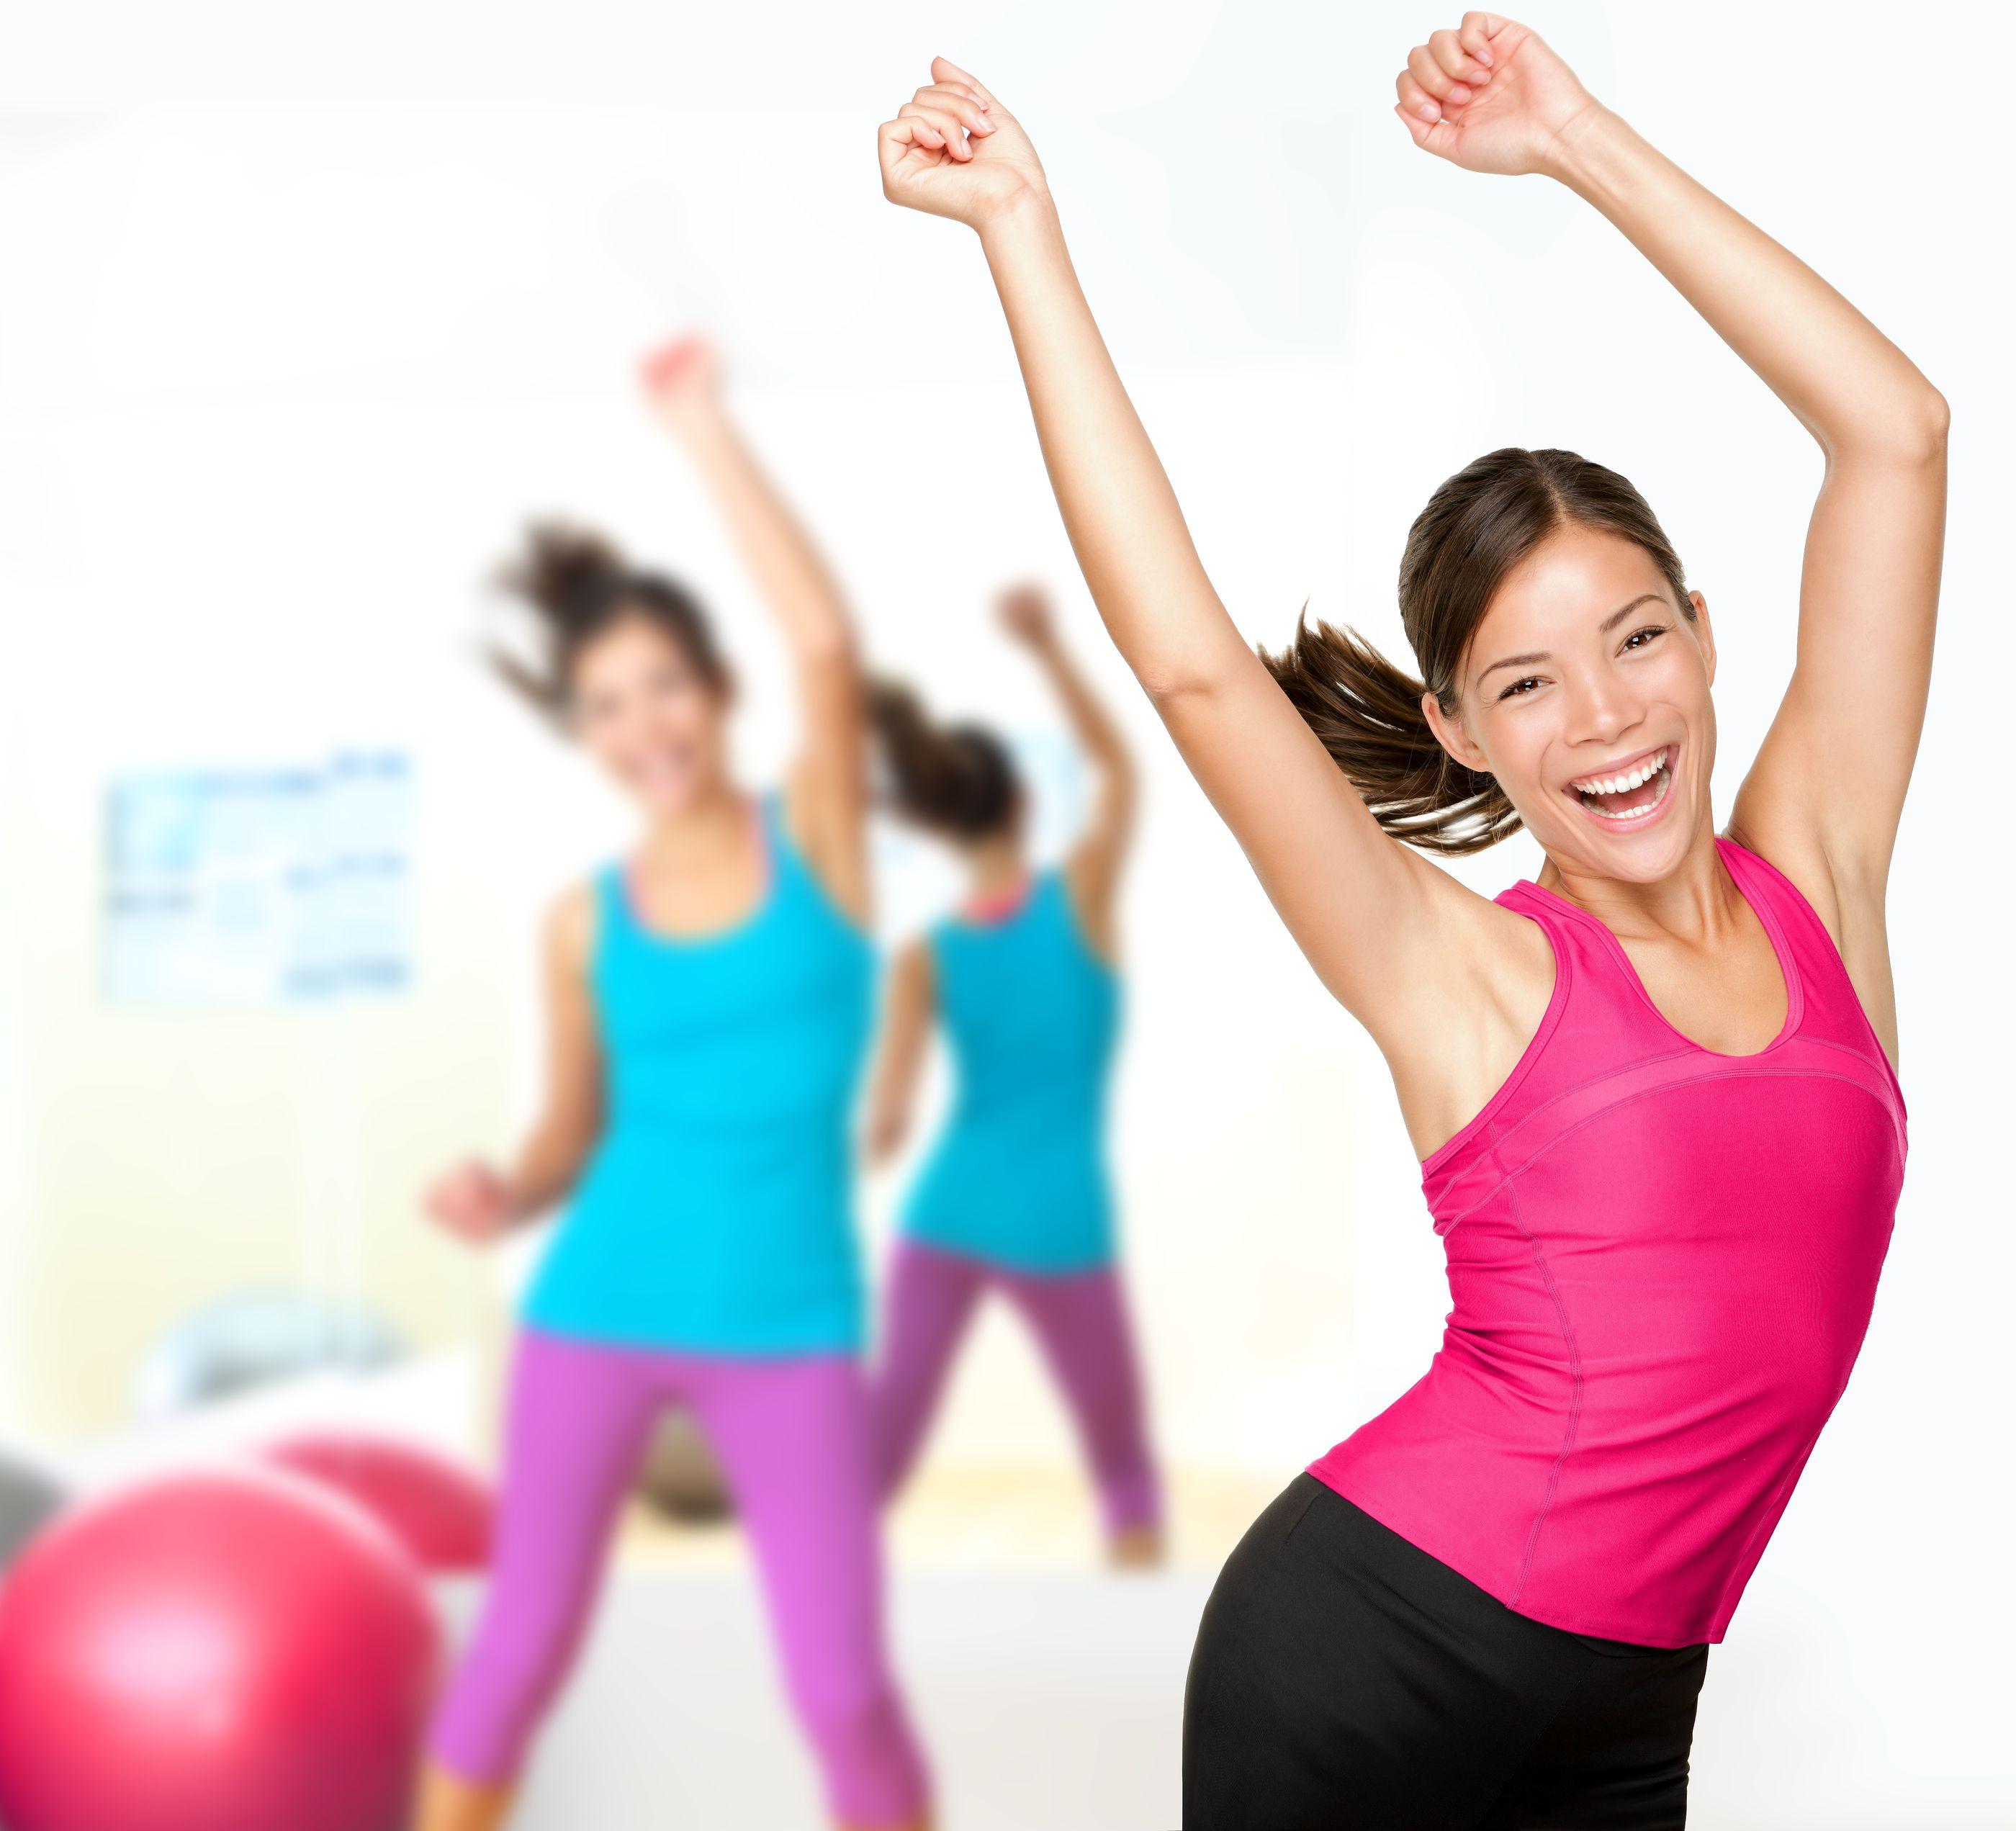 bigstock-Fitness-Dance-Class-30451937-compressor